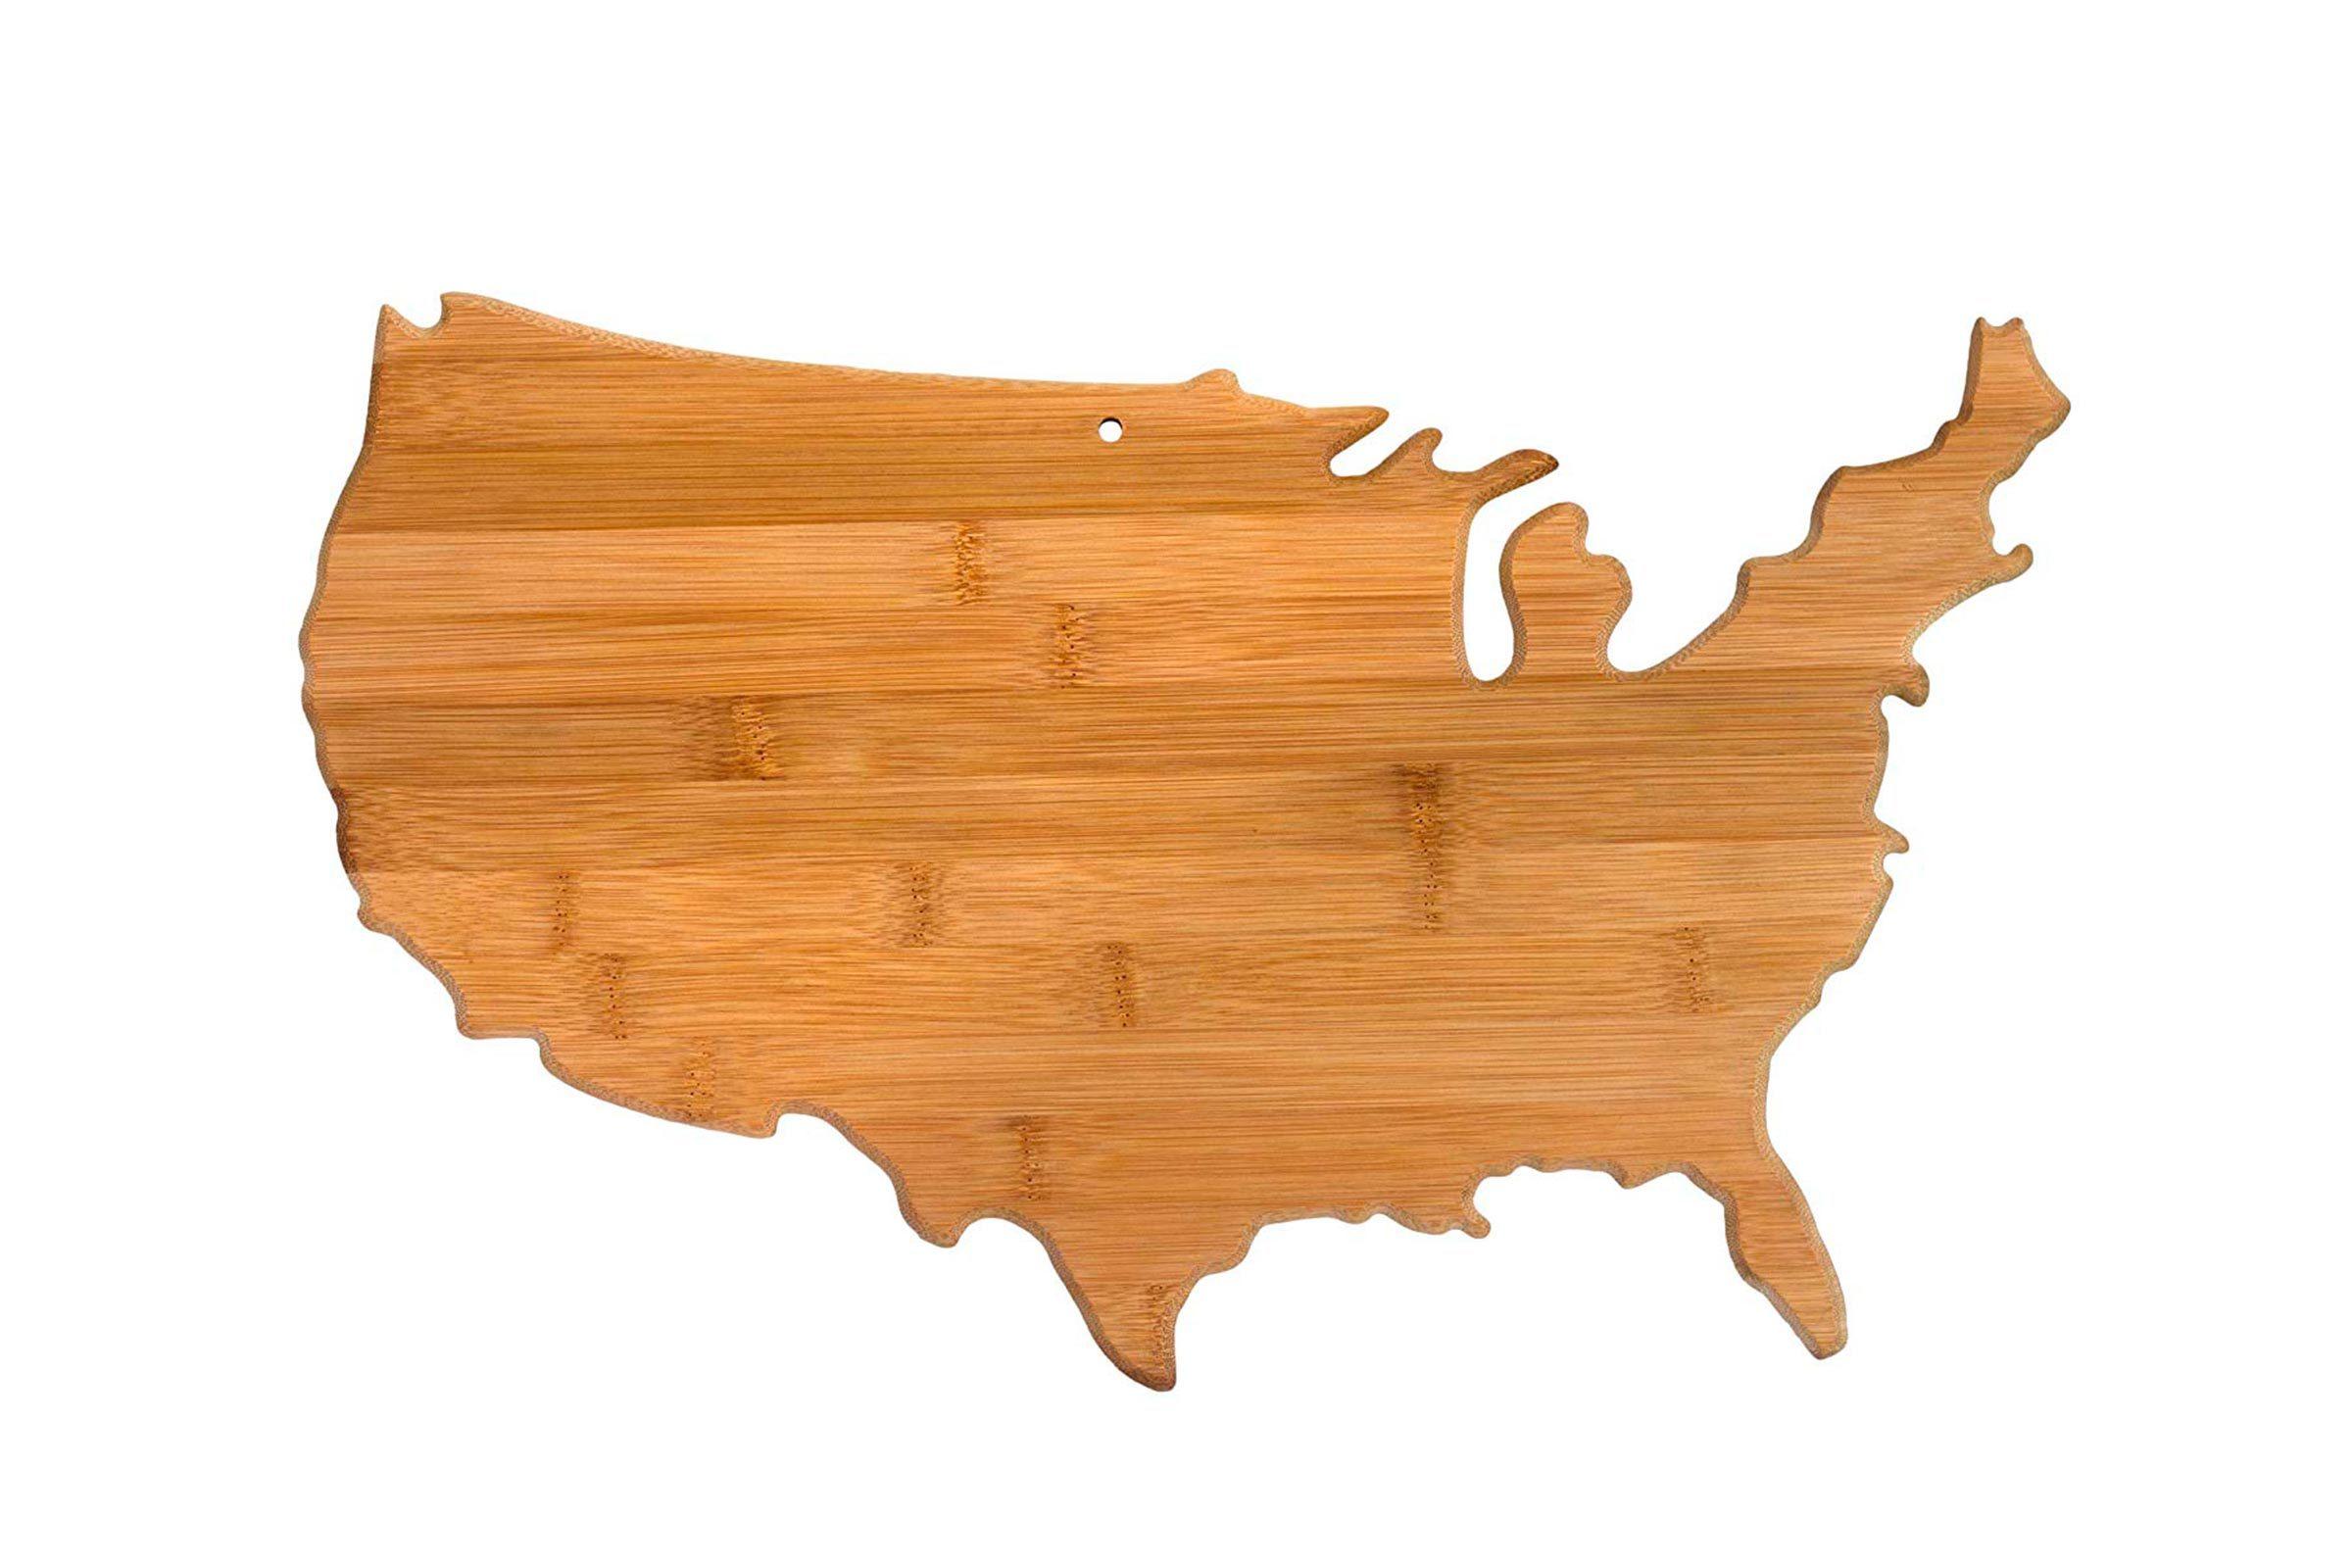 USA cutting board